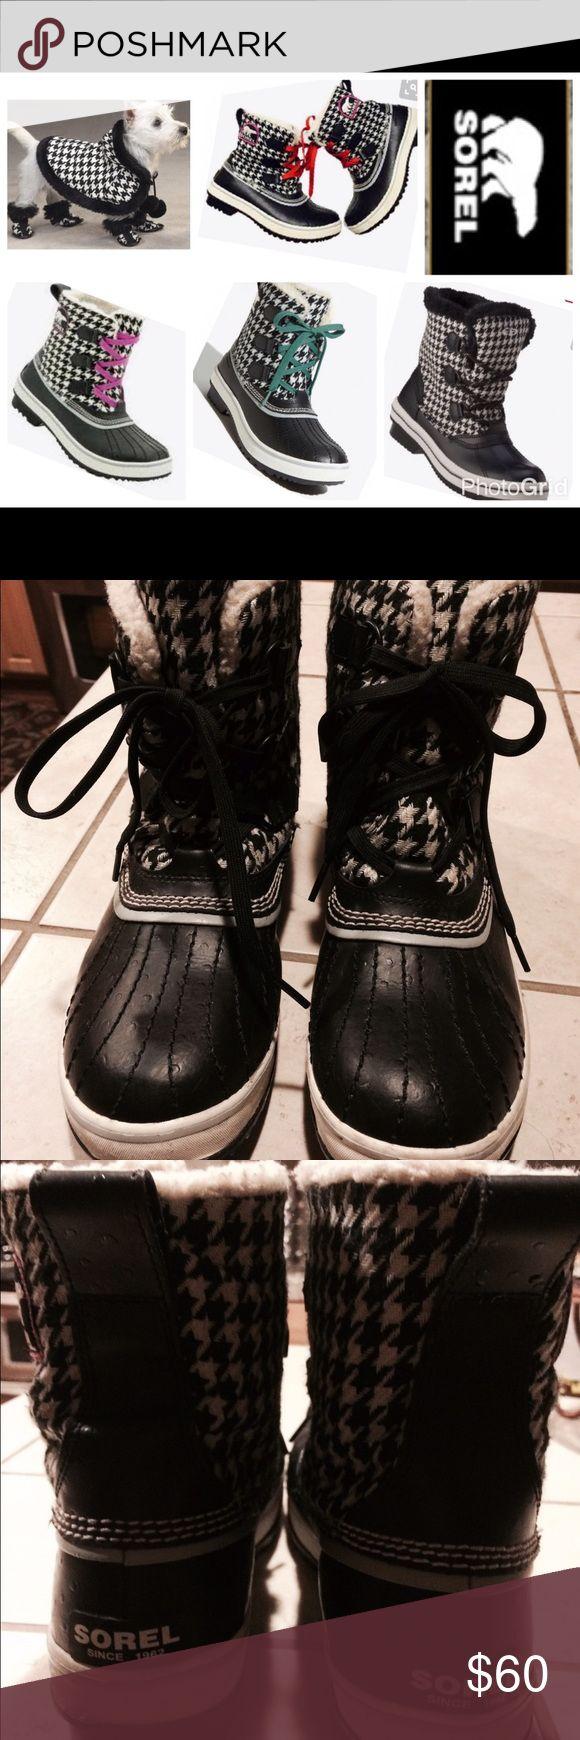 SOREL RAIN/SNOW BOOTS Sorel winter/rain boots rated -10 degrees sheepskin fur inside, water resistant outside used but still in great shape Sorel Shoes Winter & Rain Boots